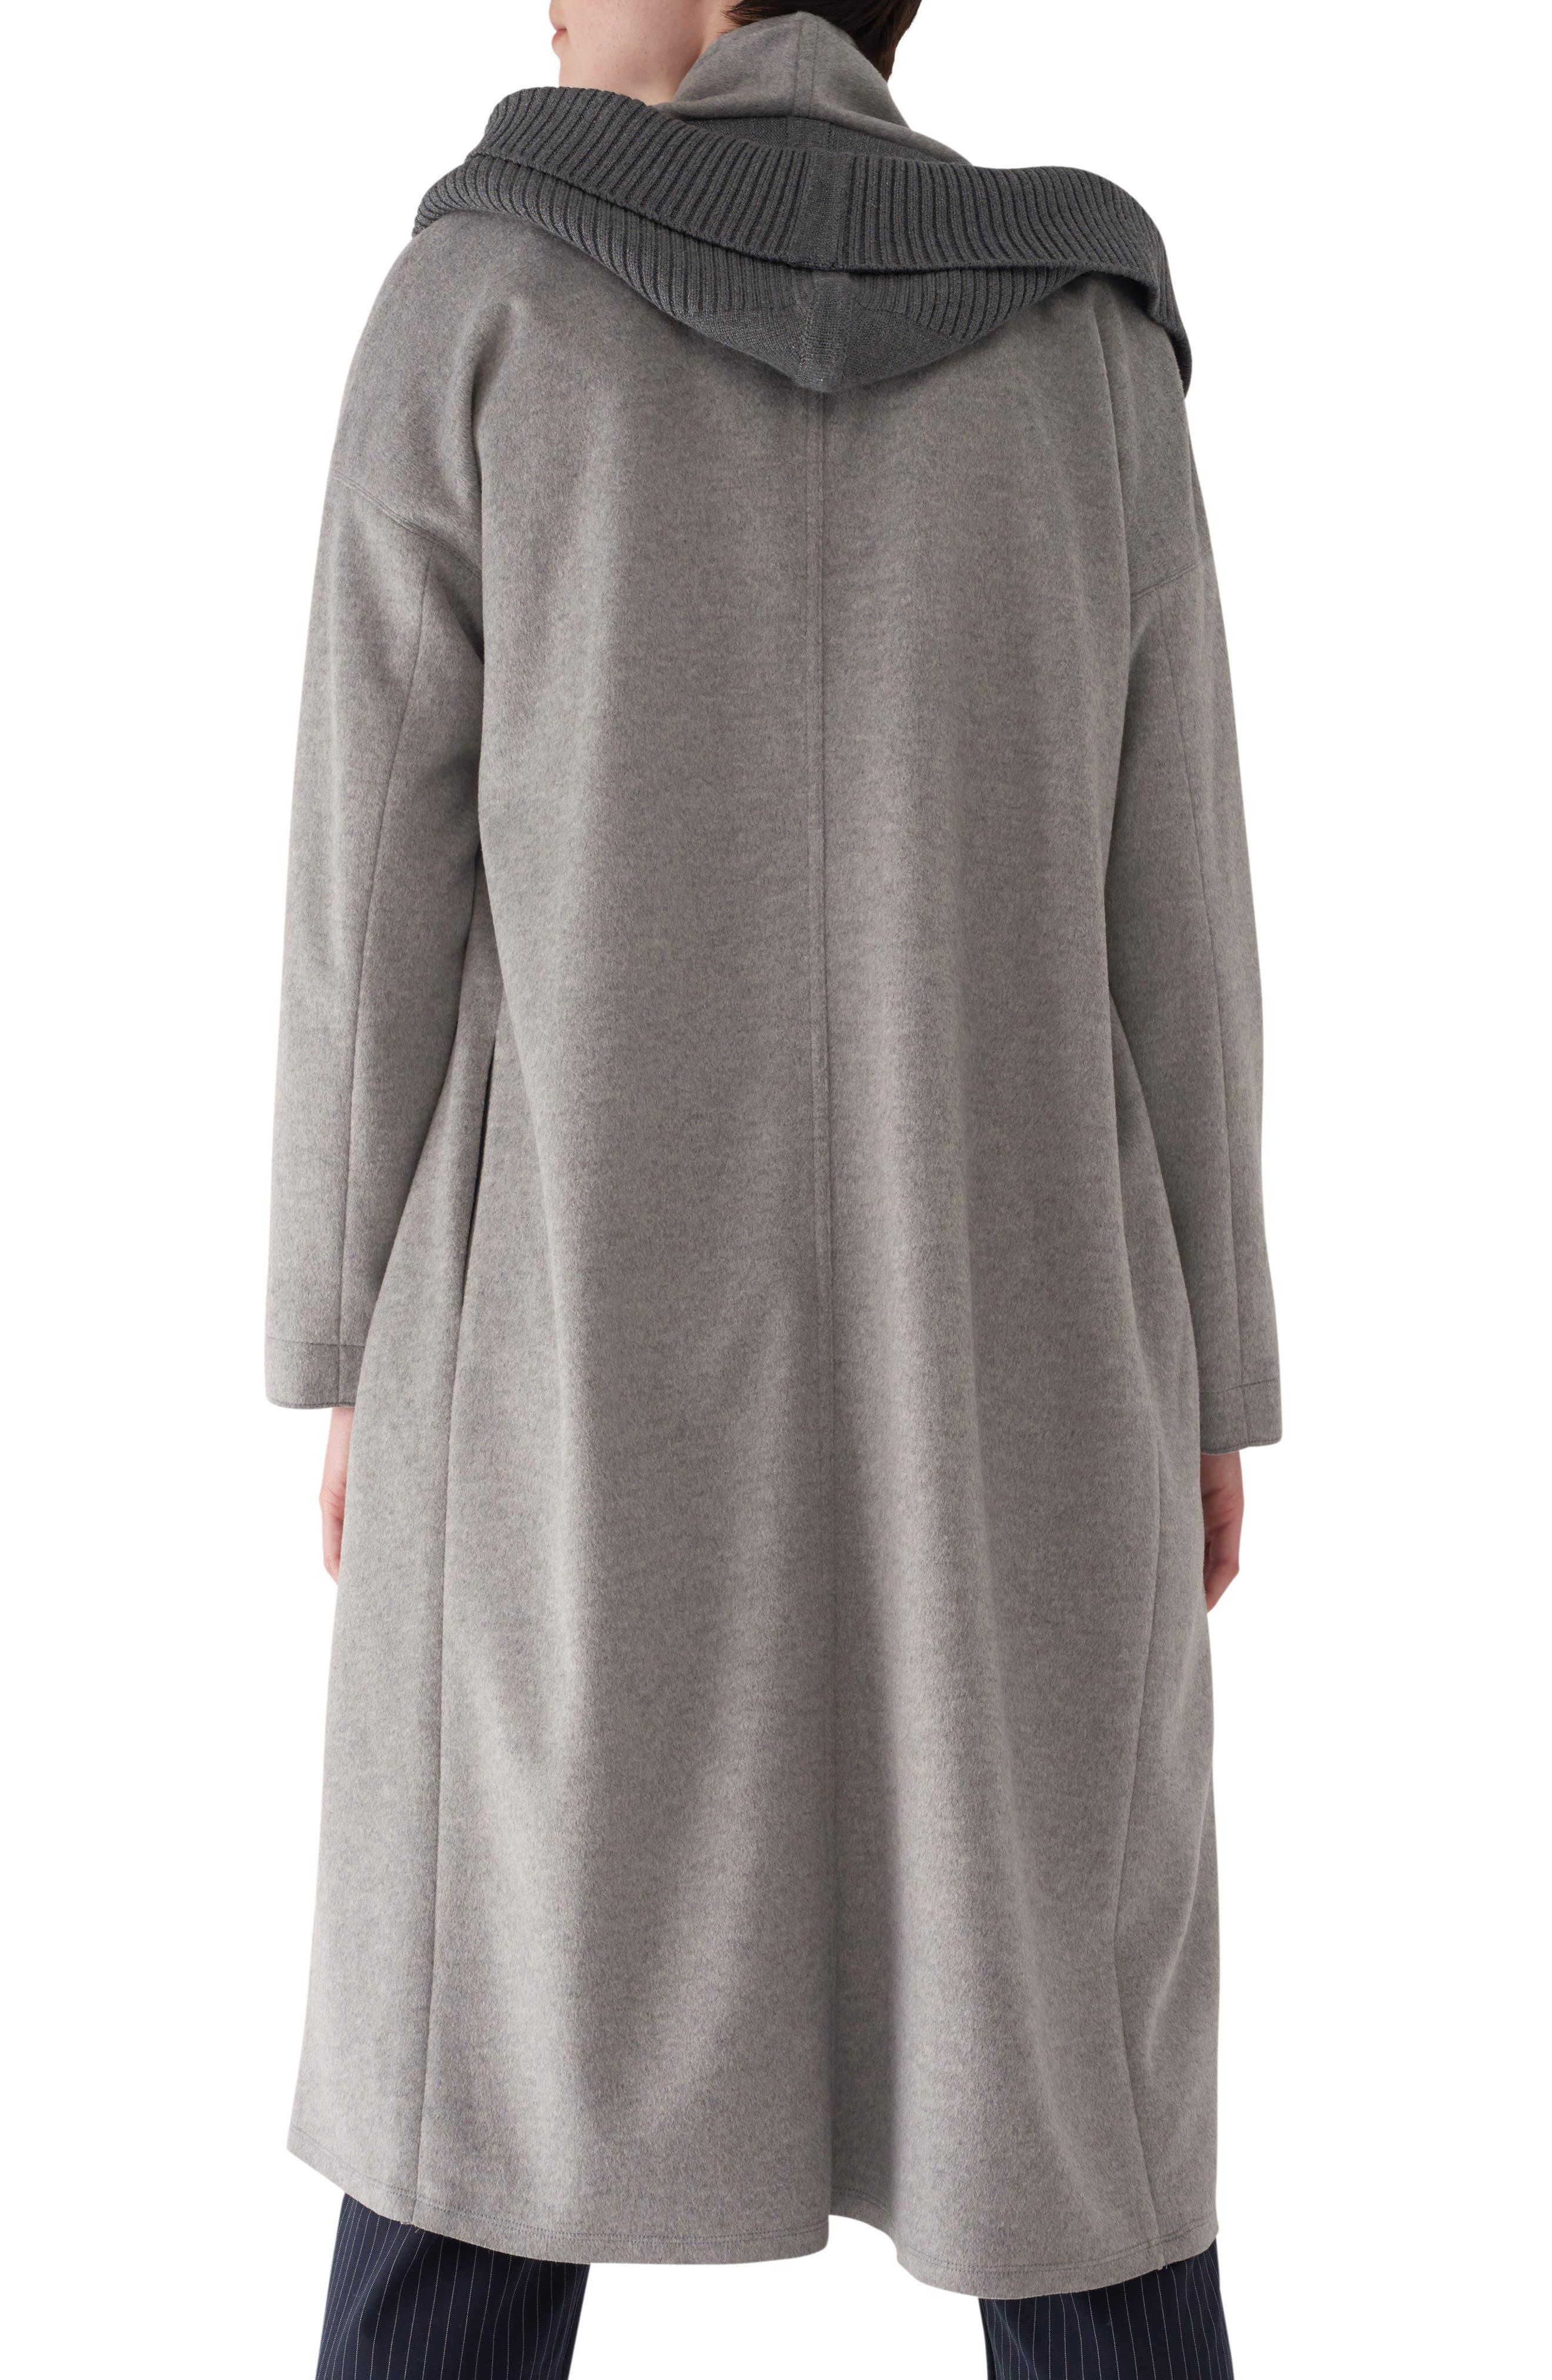 Brandy Stone Grey Duster Coat,                             Alternate thumbnail 2, color,                             GREY